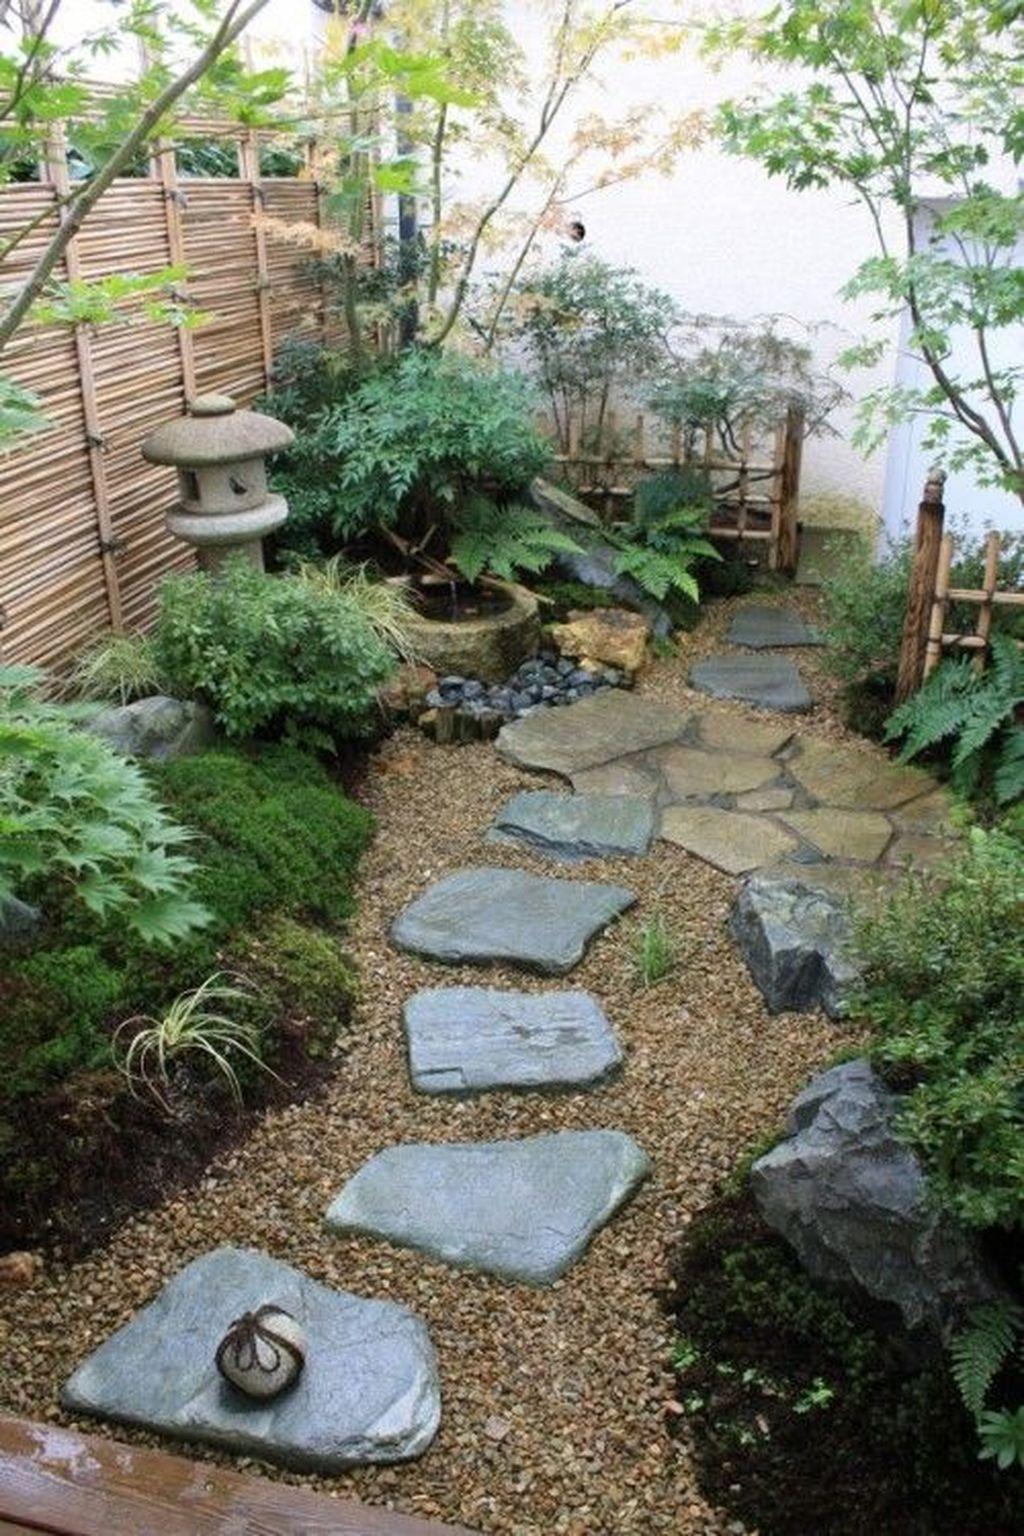 32 Stunning Tiny Garden Design Ideas To Get Beautiful Look #asiangarden